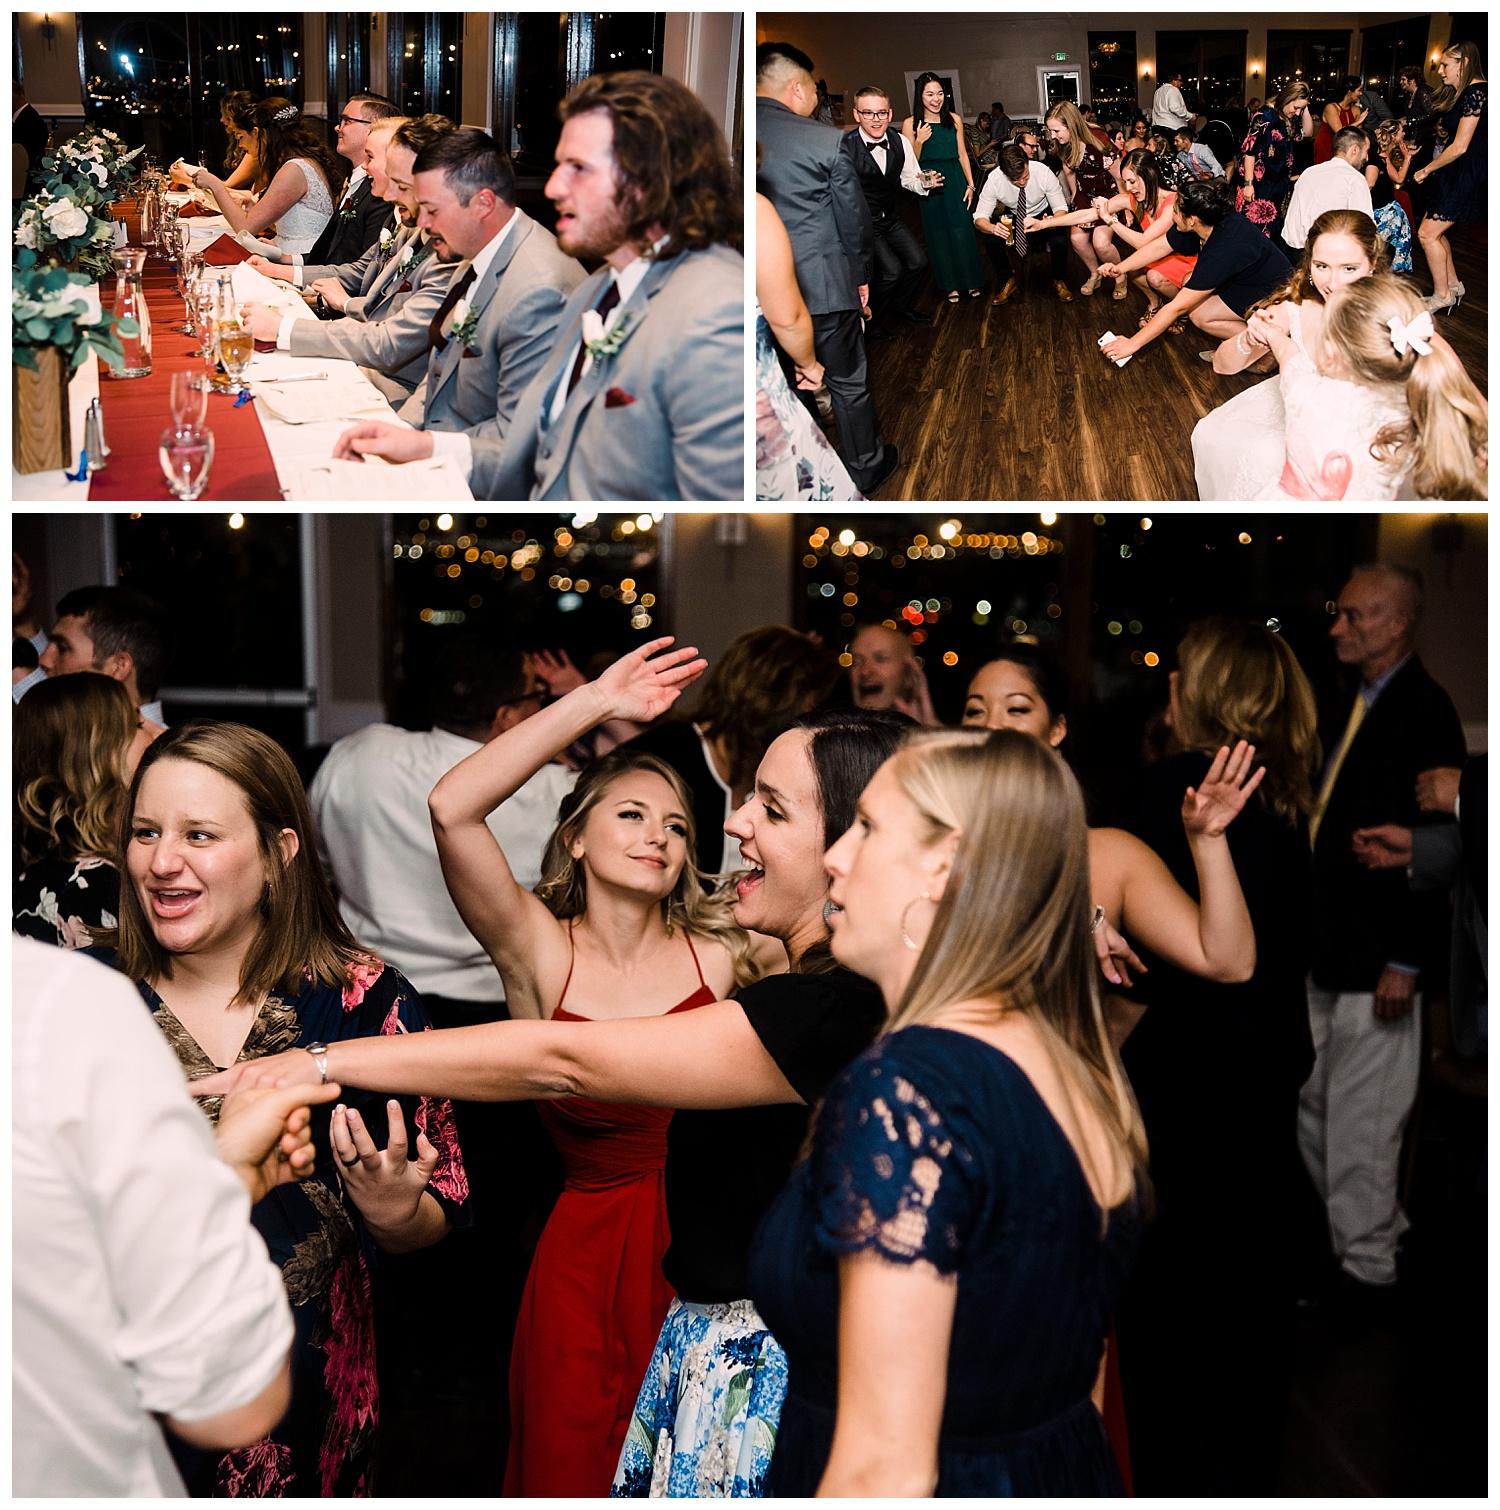 Danish_Wedding_Traditions_Denver_Colorado_Photographer_Wedgewood_Brittany_Hill_Apollo_Fields_029.jpg